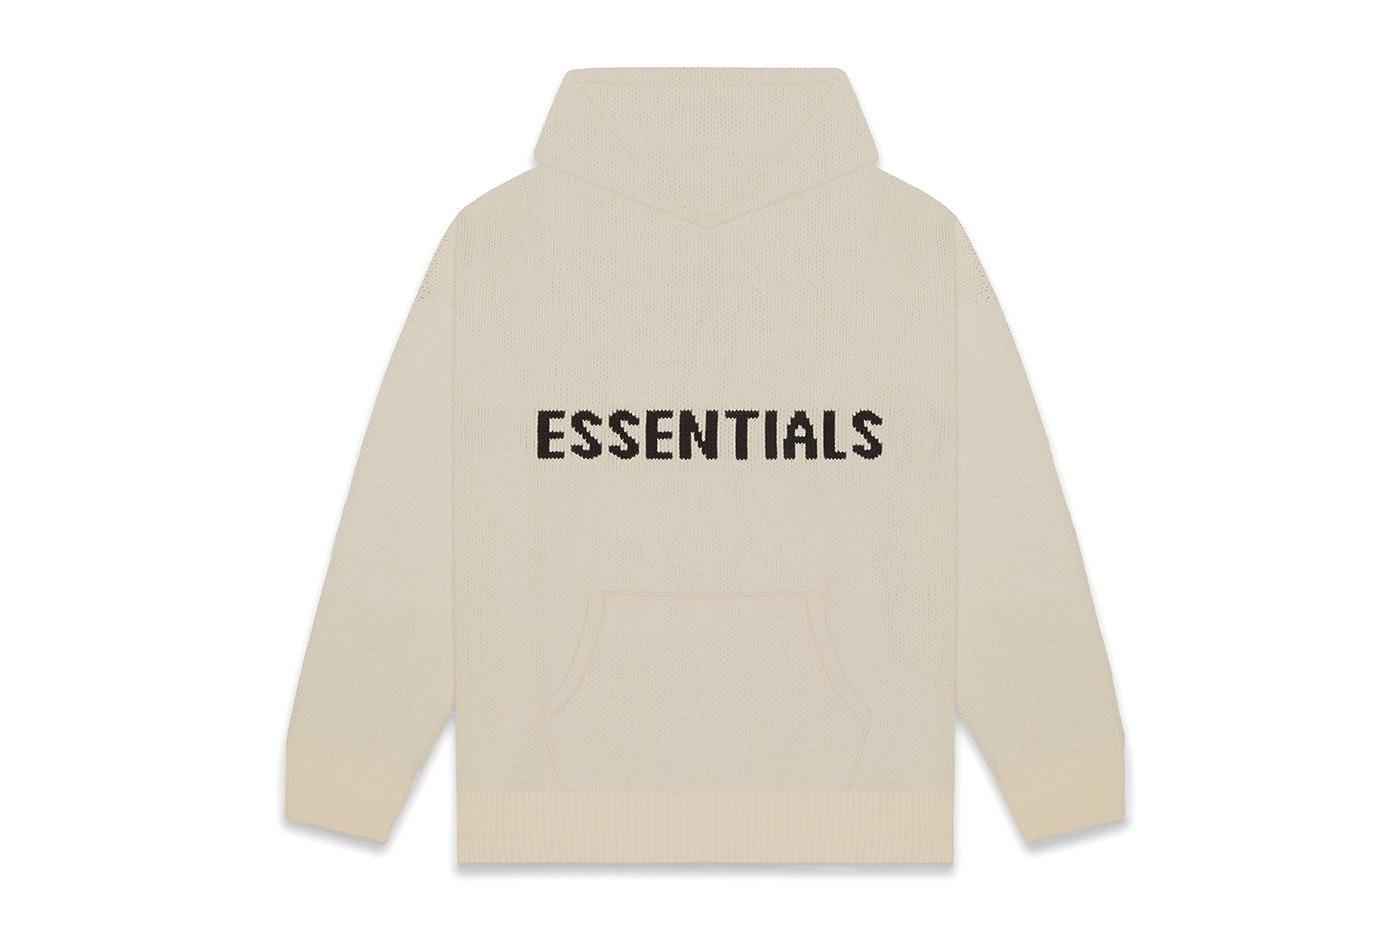 Fear Of God FOG Essentials Khaki// Cement Hoodie Sweatshirt Sweater Size M Medium